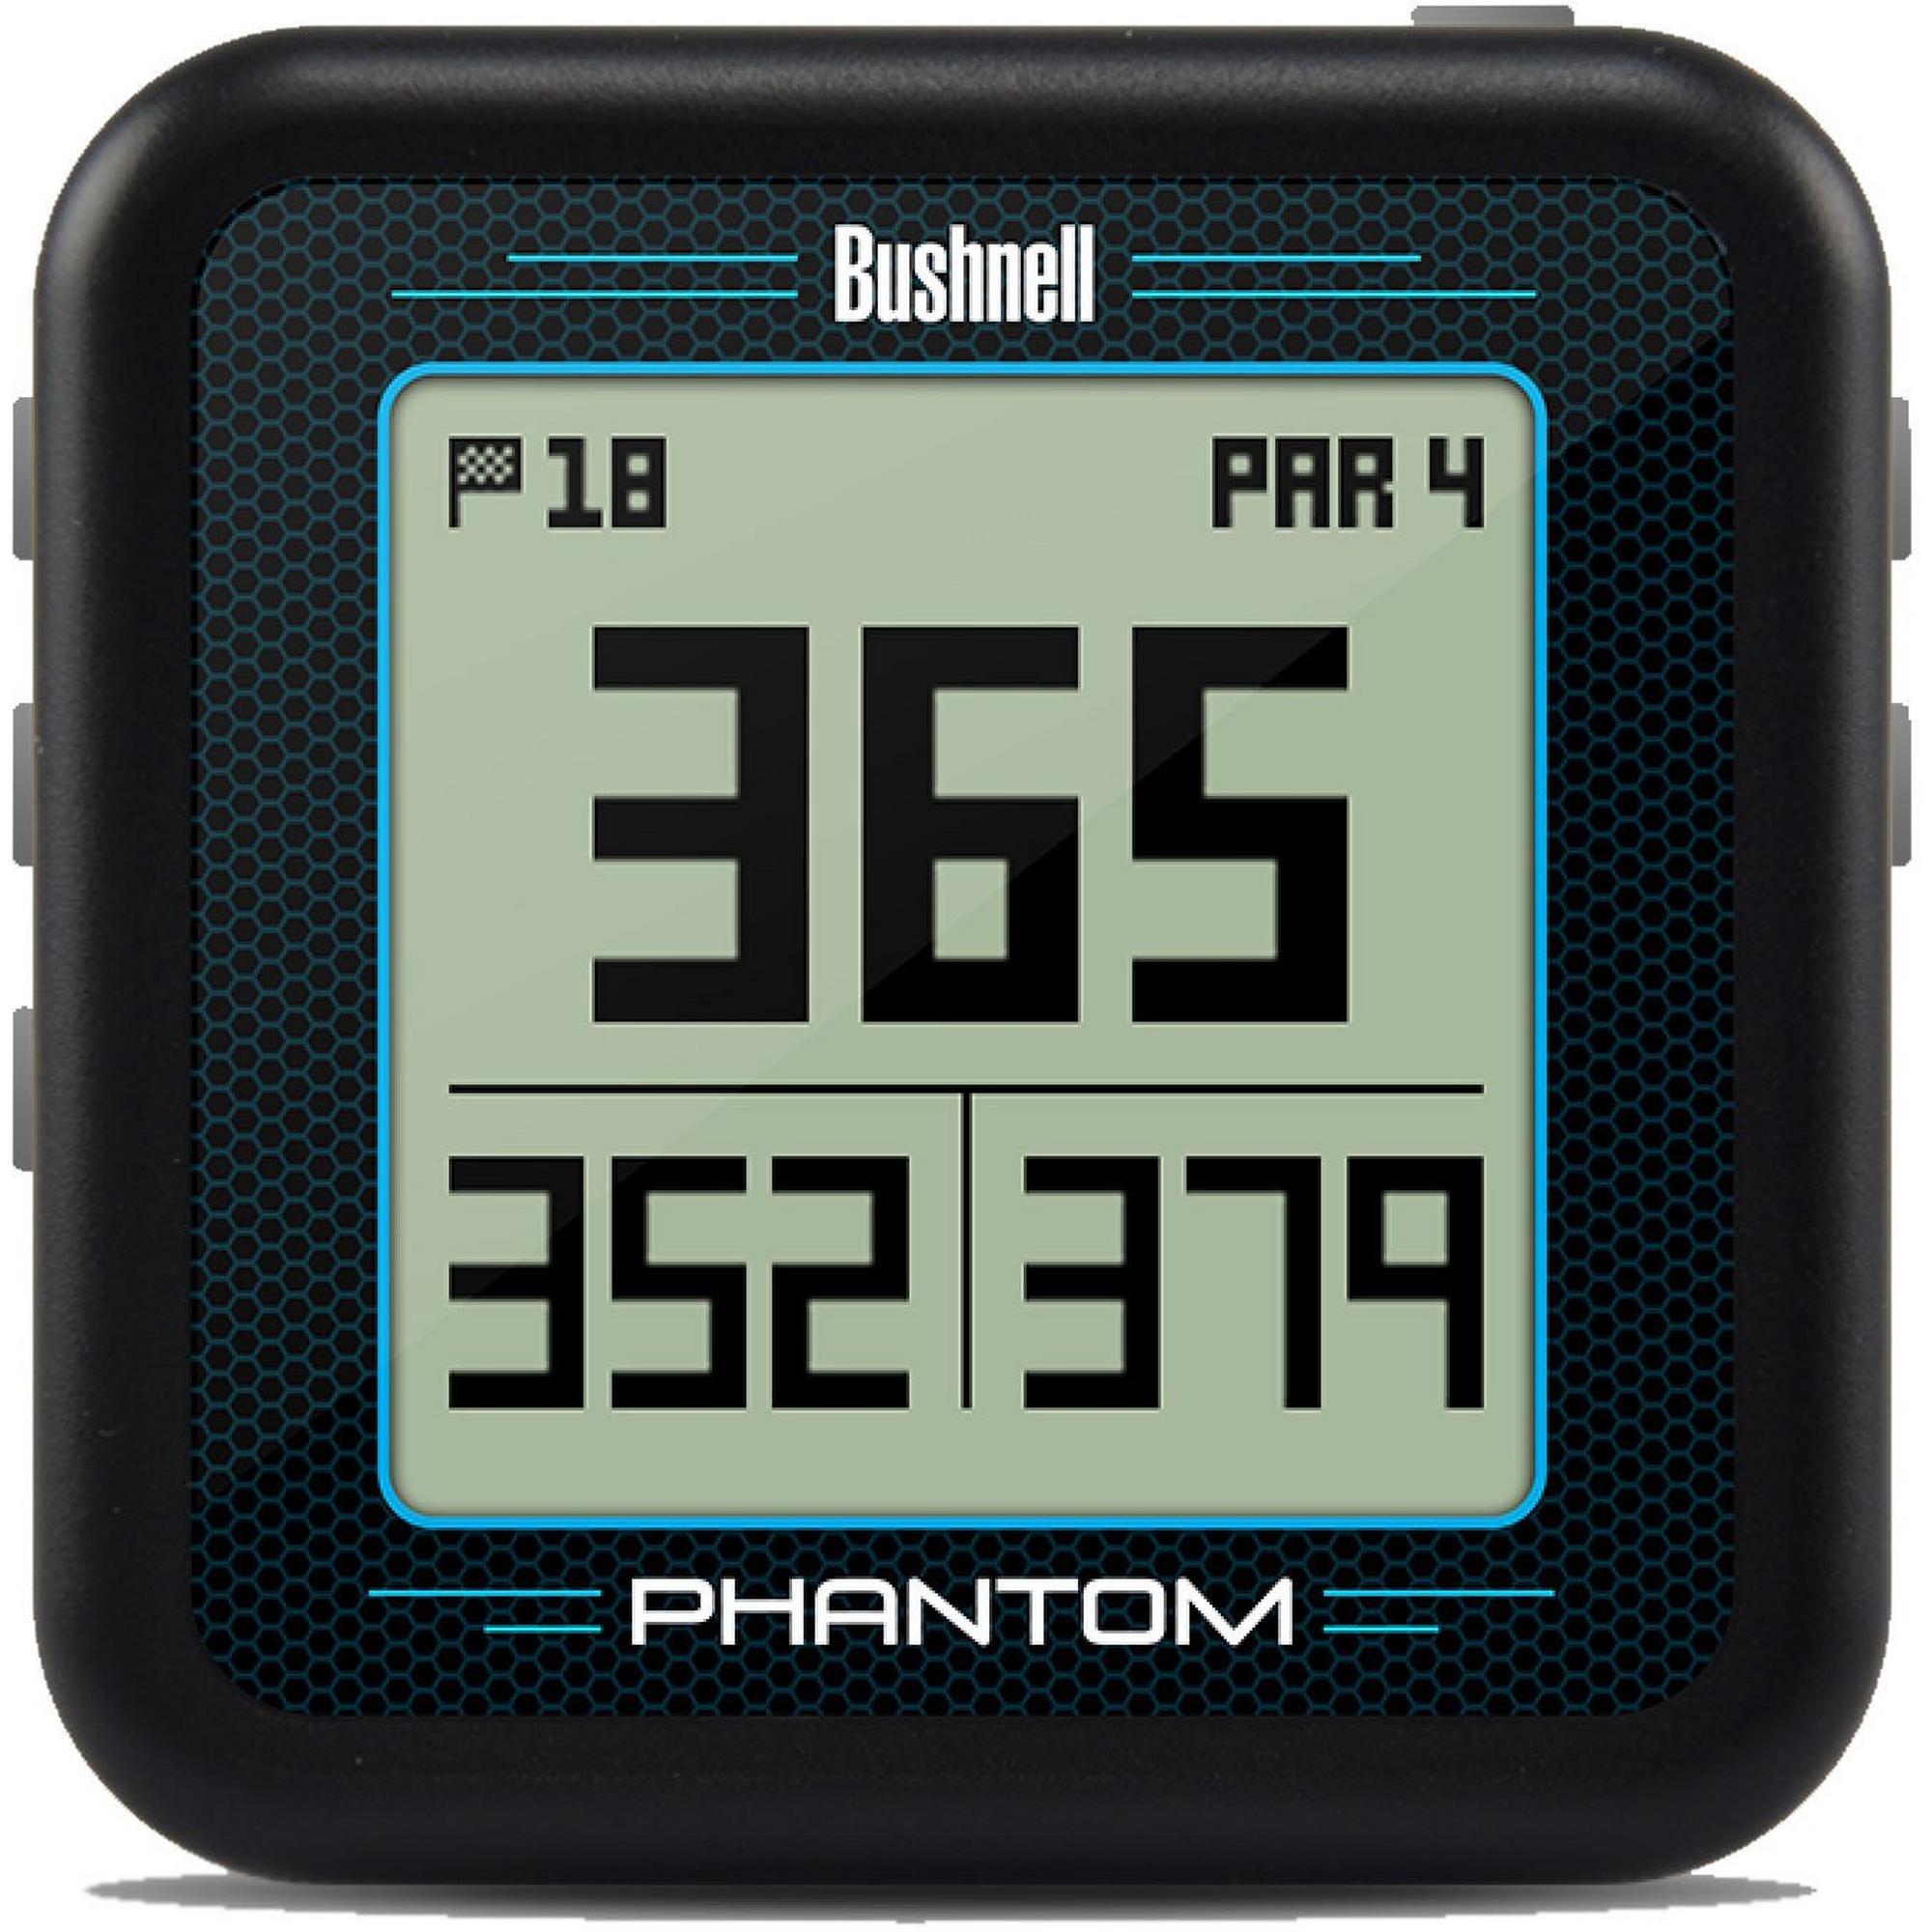 Phantom Handheld Golf GPS